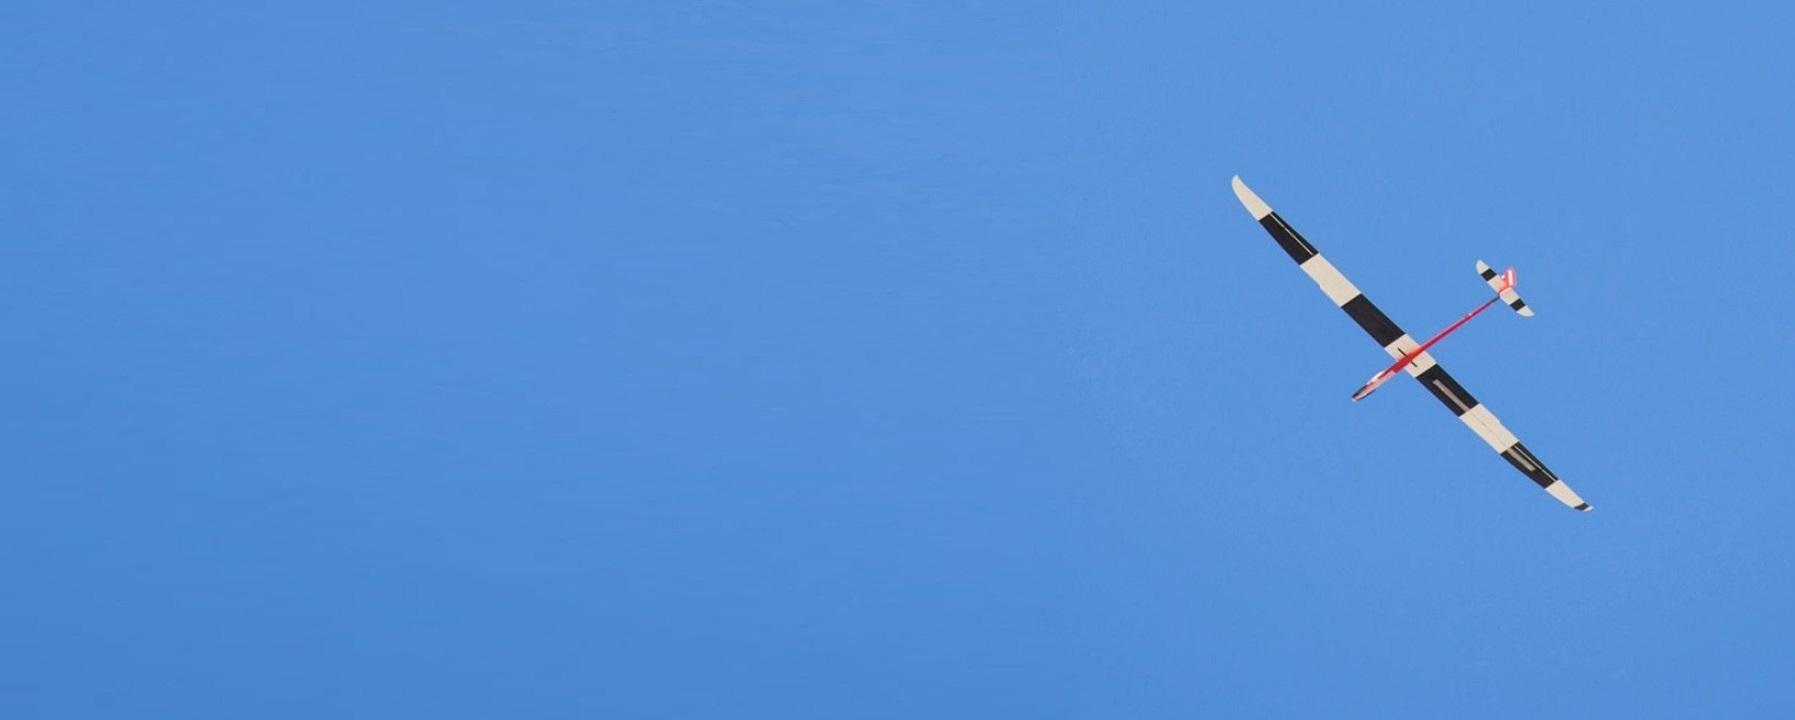 Project Frigatebird: AI for Autonomous Soaring - Microsoft Research